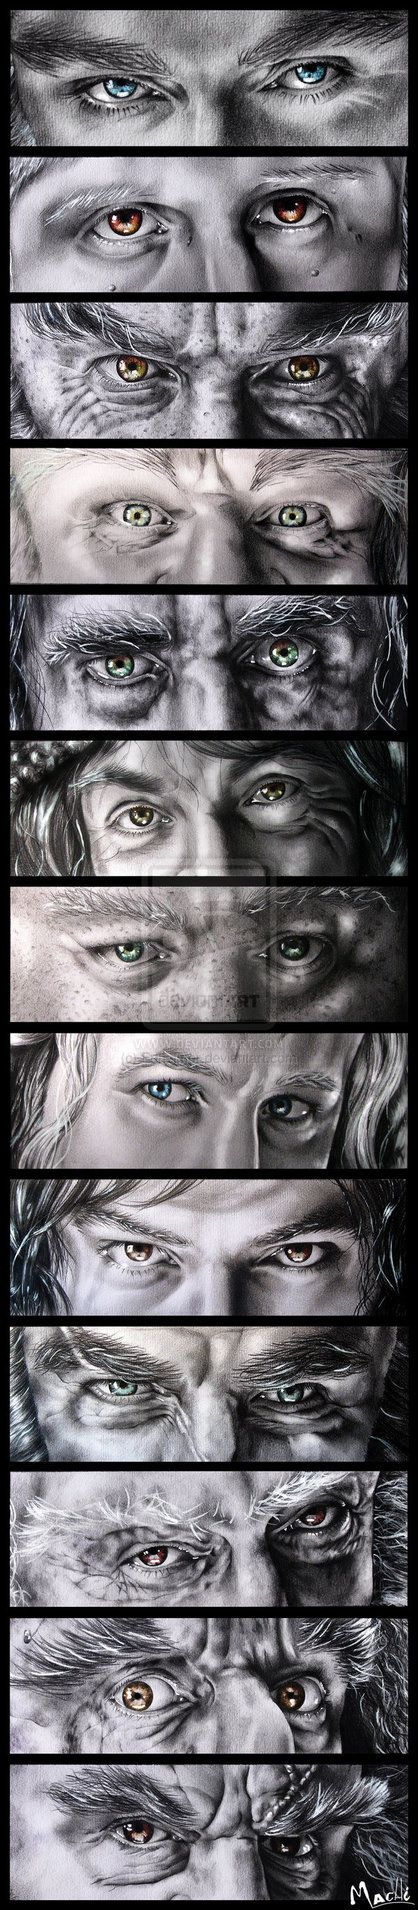 The Dwarves eyes. Thorin, Ori, Nori, Dori, Bifur, Bofur, Bombur, Fili, Kili, Dwalin, Balin, Oin e Gloin...These guys would have scared Snow White to death. LOL